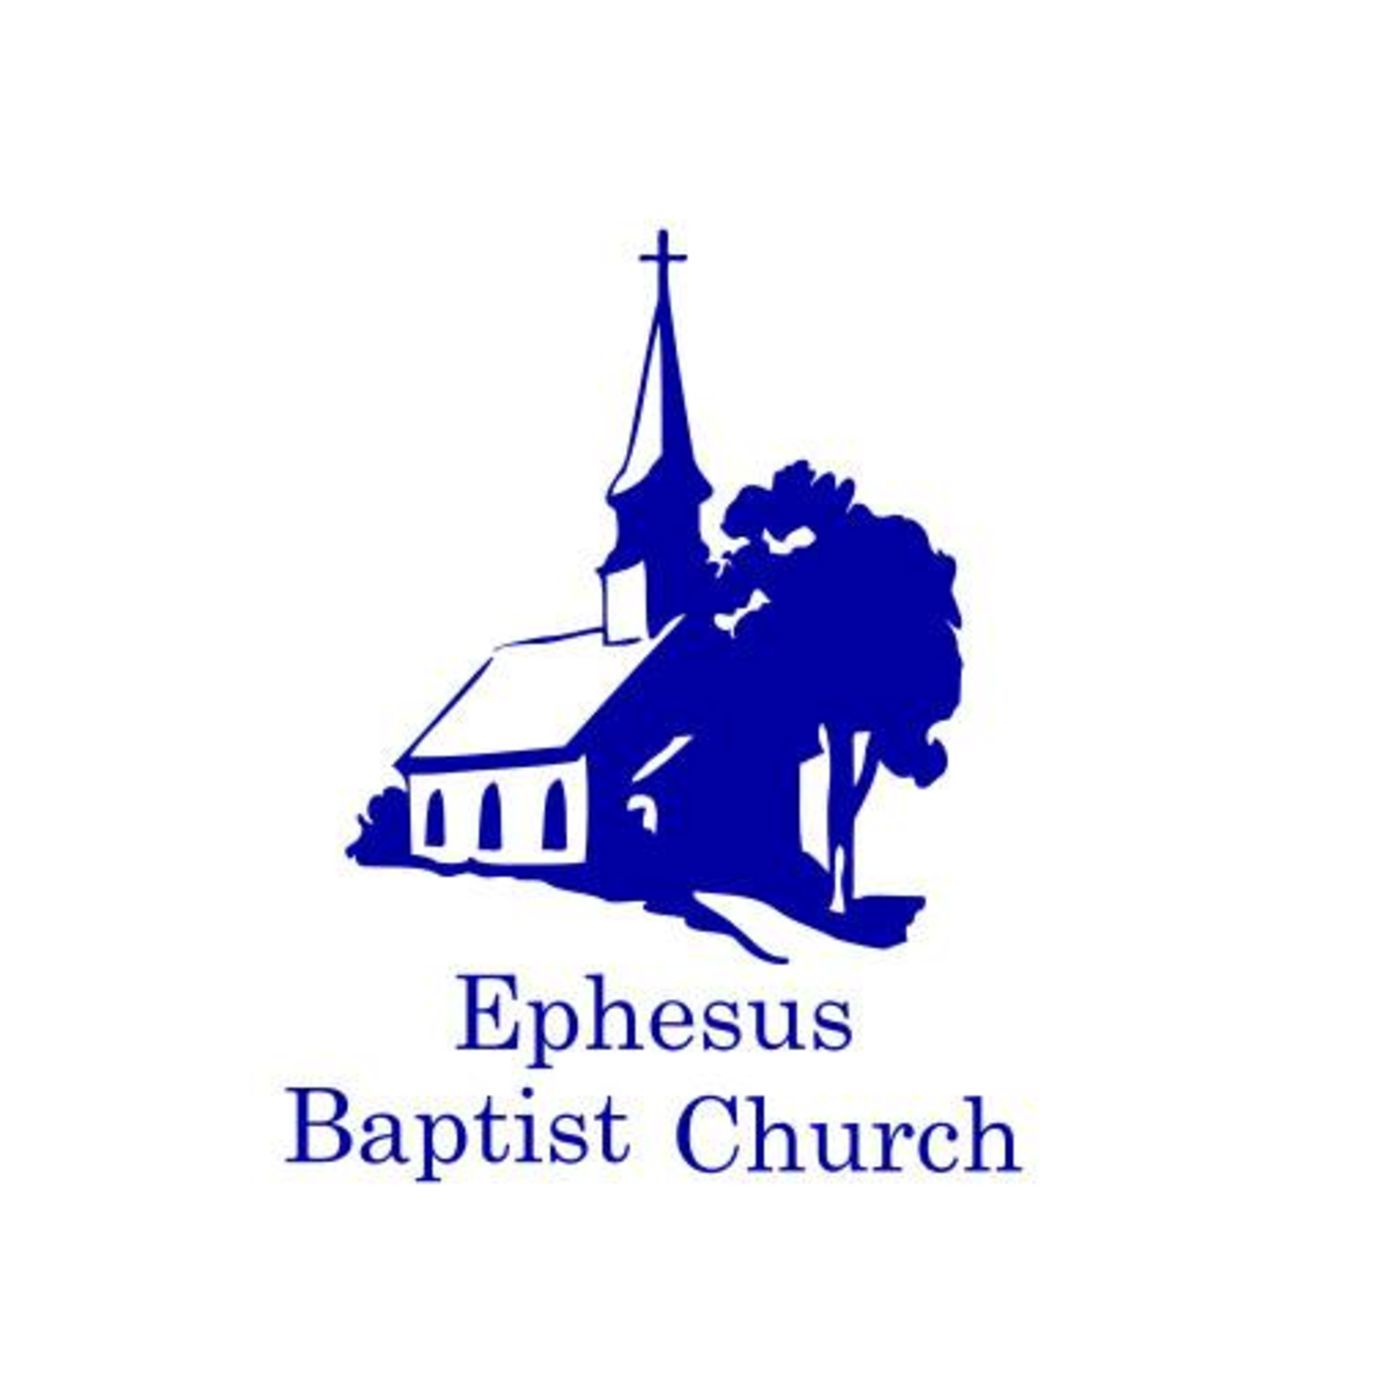 Ephesus Baptist Church, Winchester, Ky